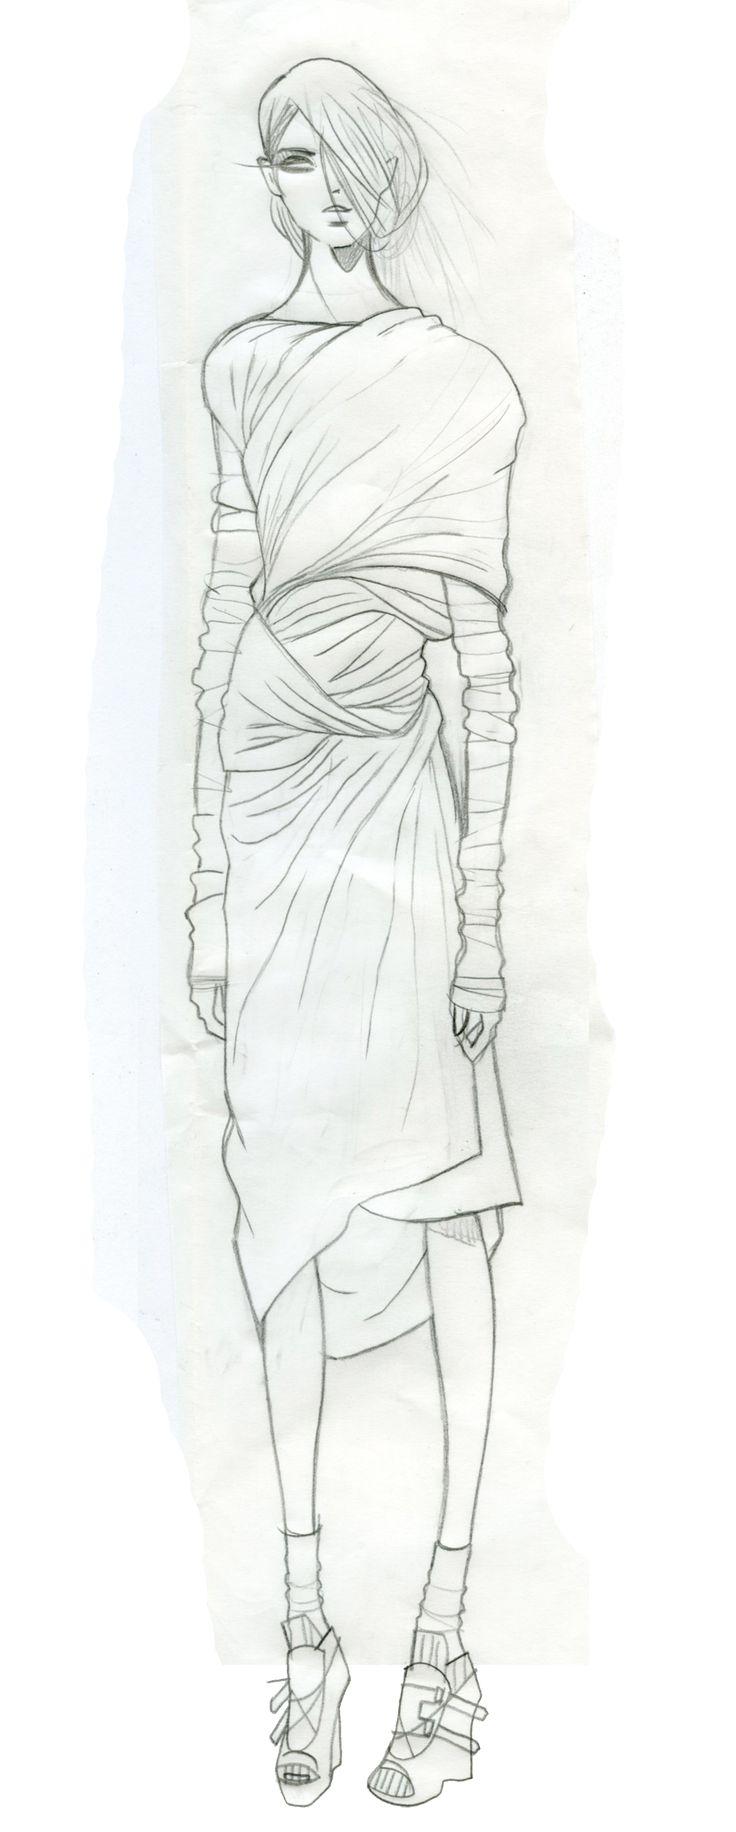 Stephanie, London May 2014. Jaa design original fashion illustration. http://jaaarchives.com/